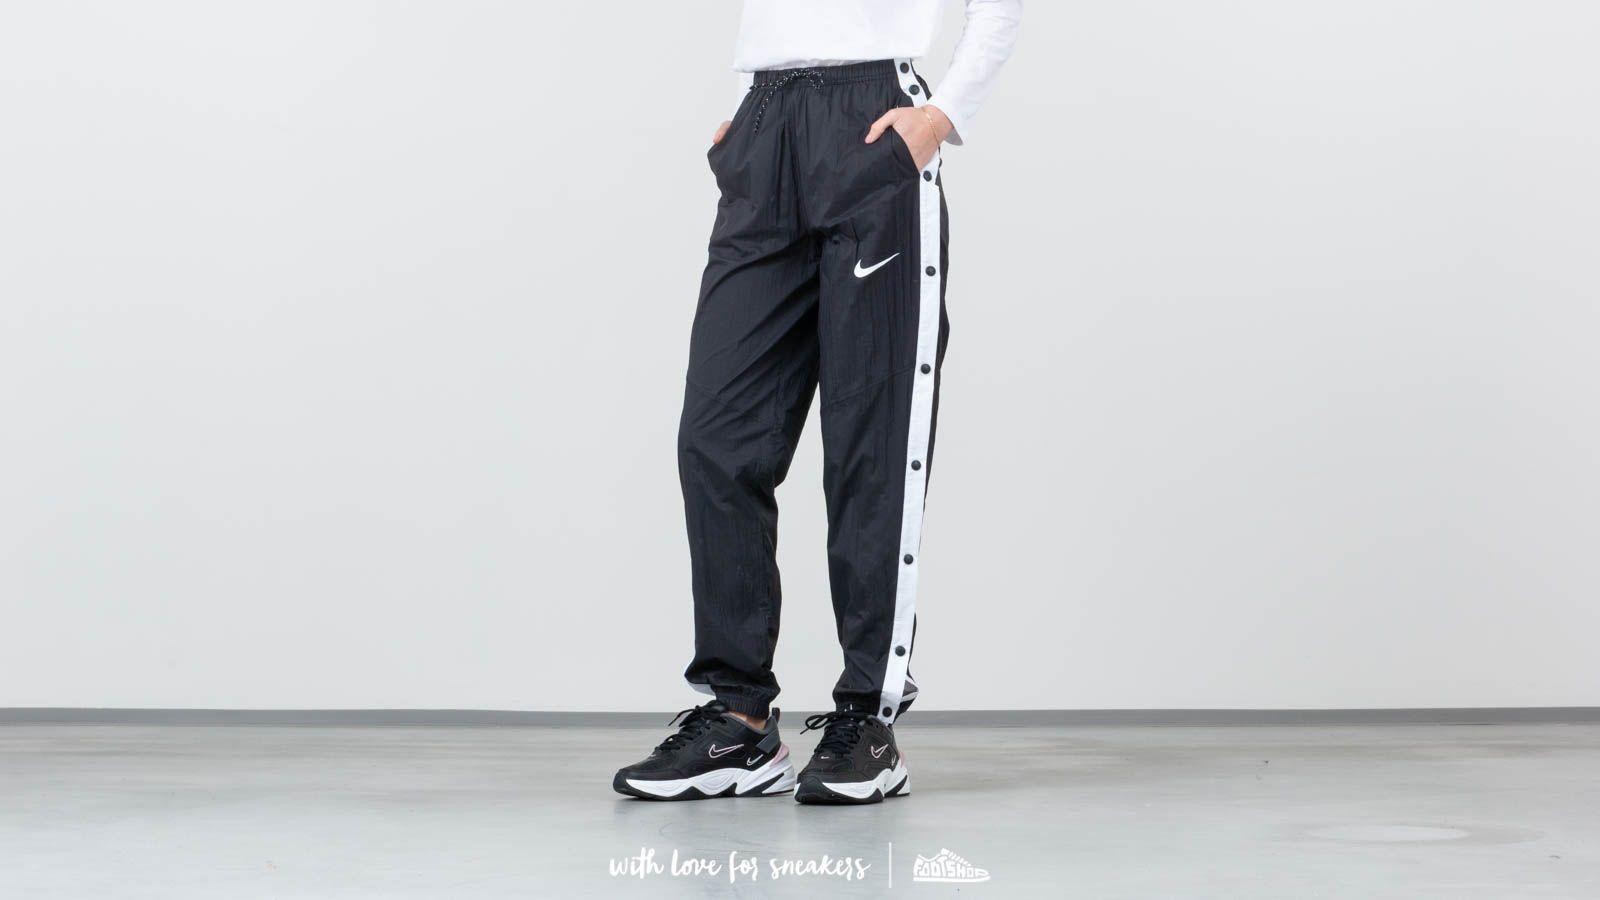 c2d9f482ac9d Nike Sportswear Windrunner Pants Black  White